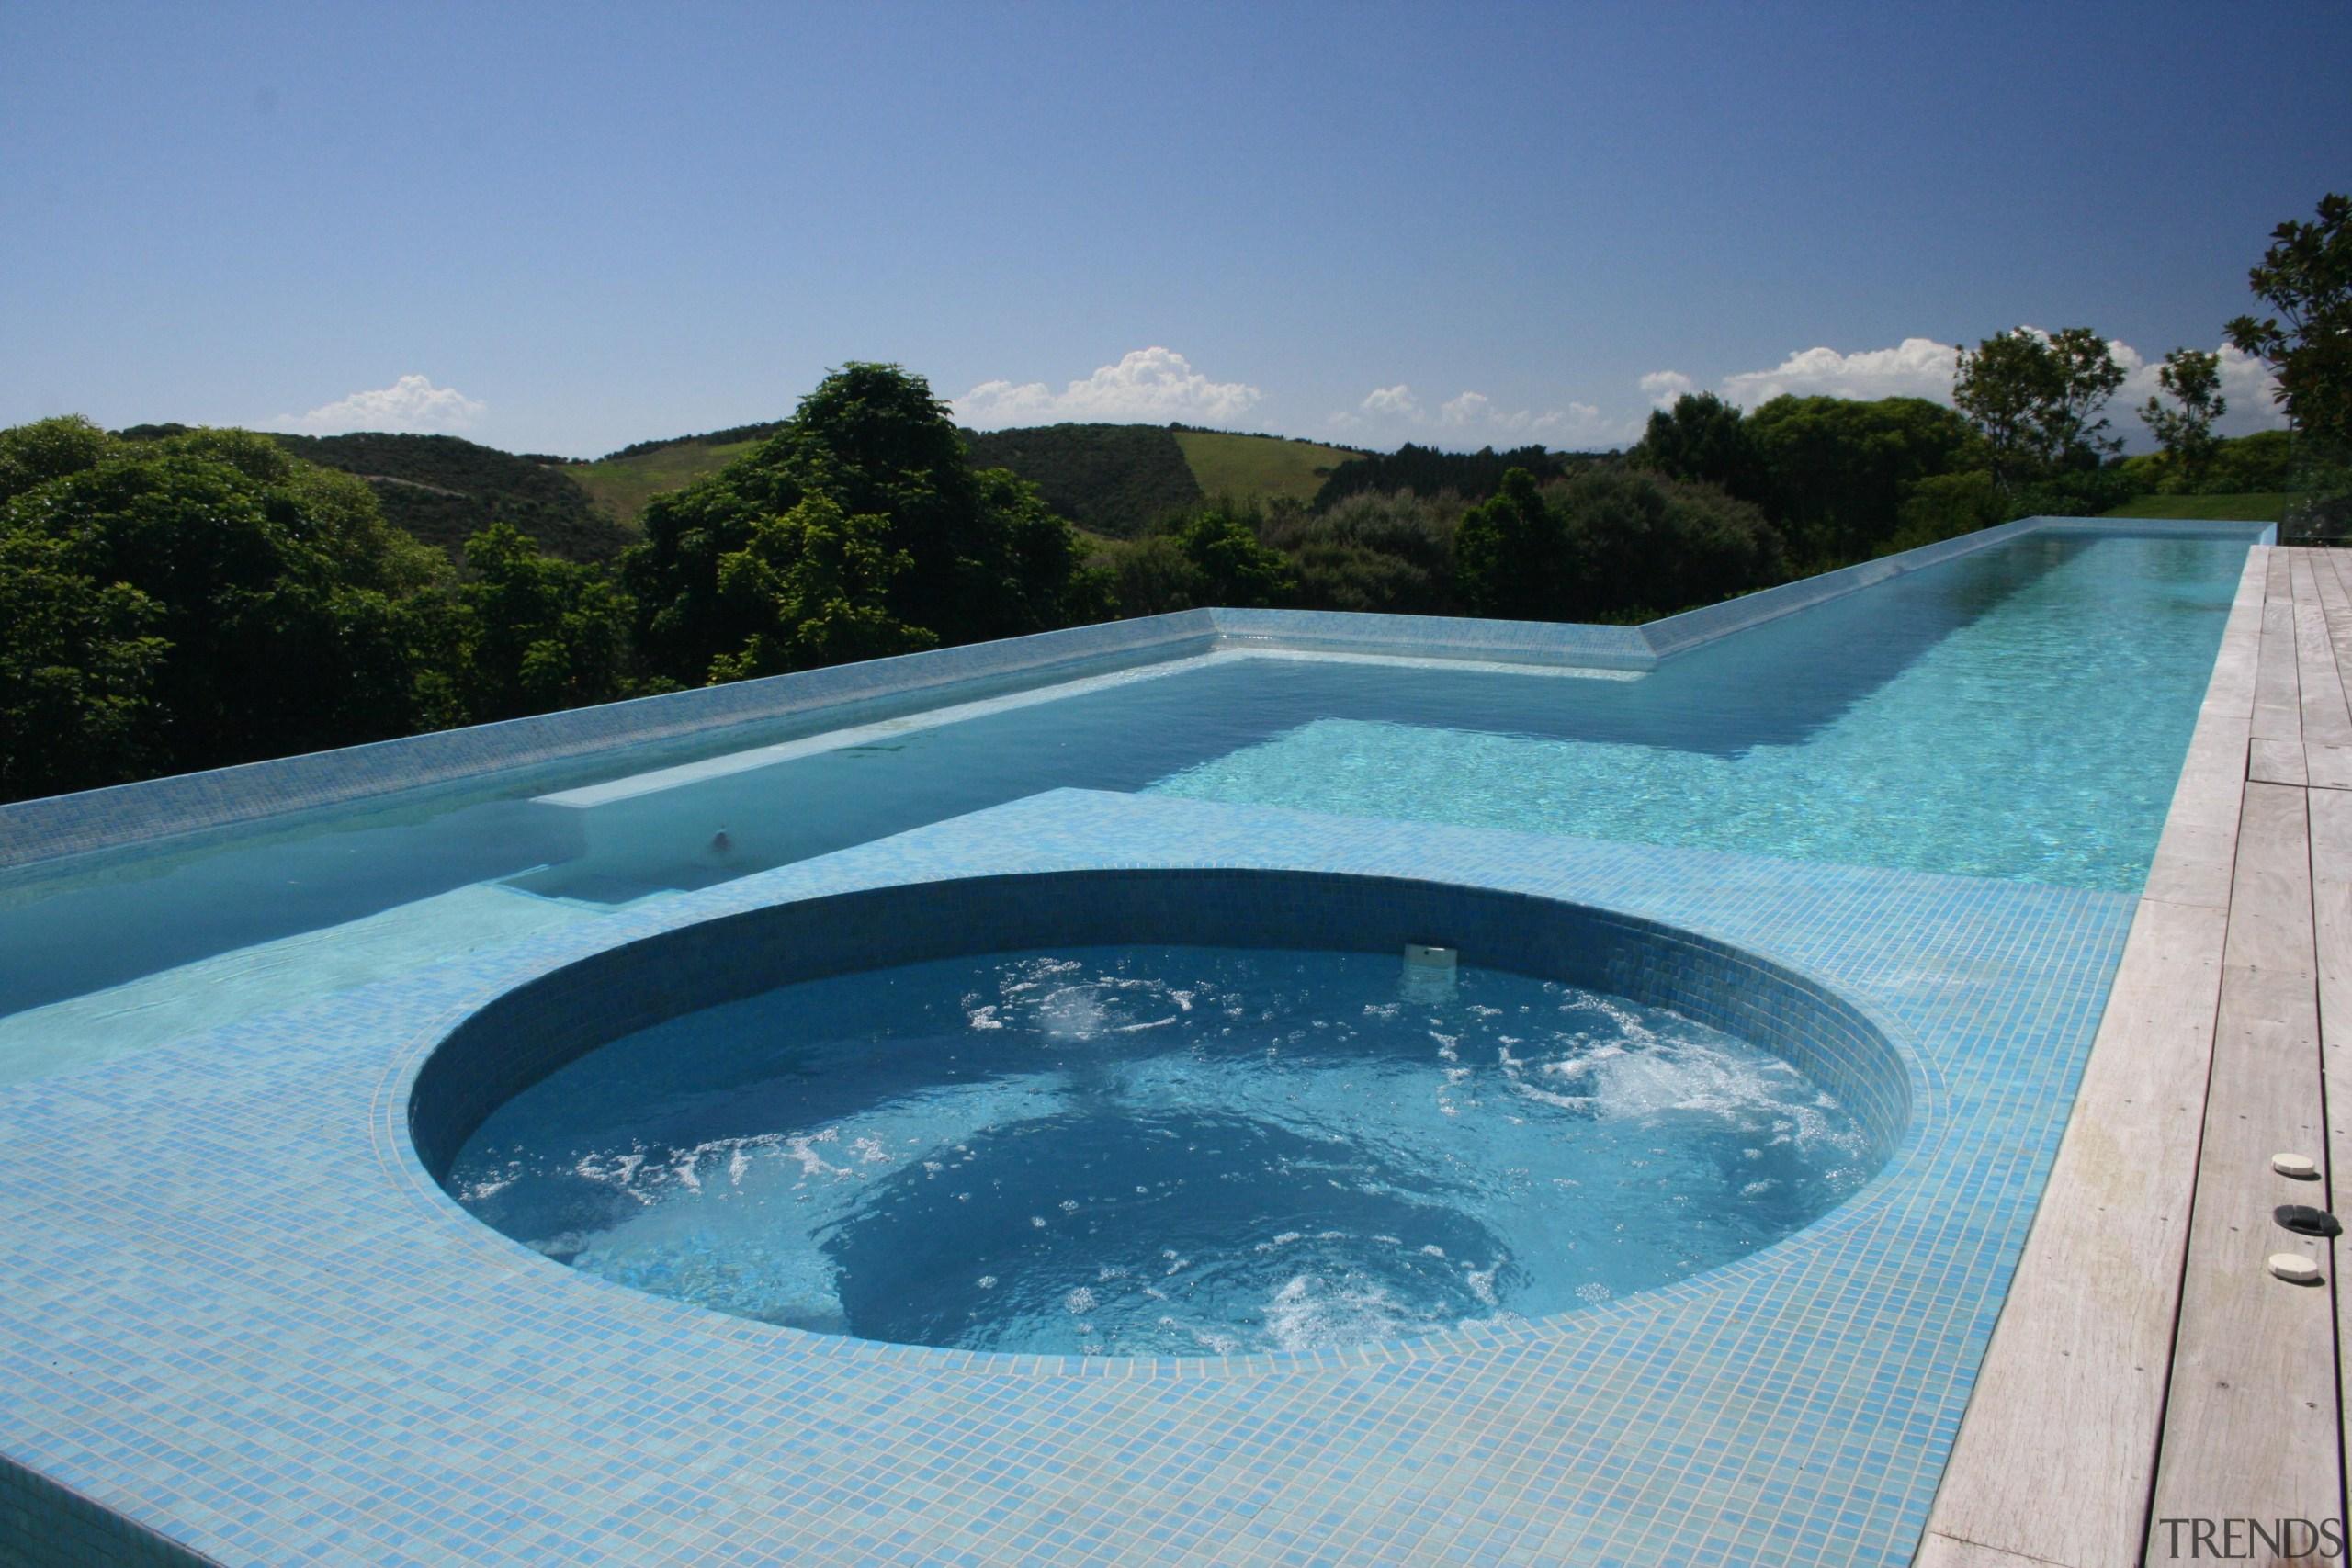 http://goo.gl/PfHsAn - Bisazza Spa Pool - estate | estate, leisure, property, real estate, swimming pool, water, water resources, teal